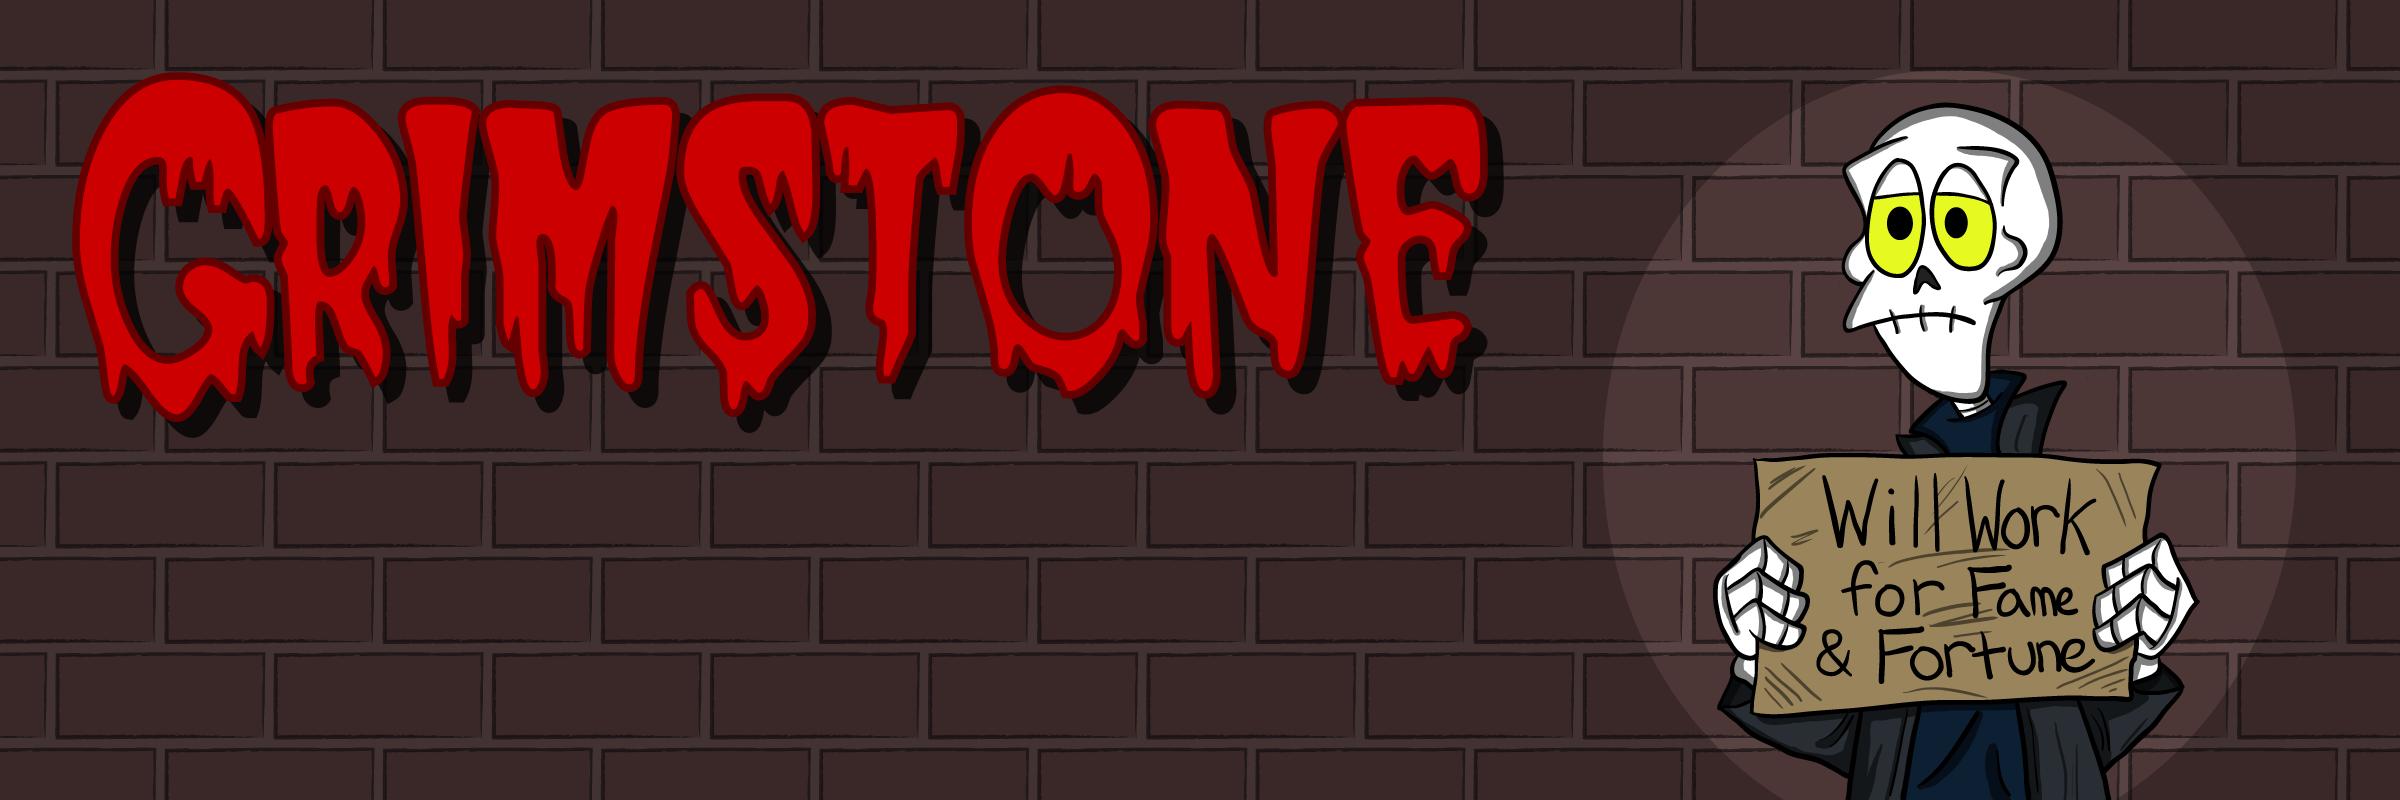 Grimstone